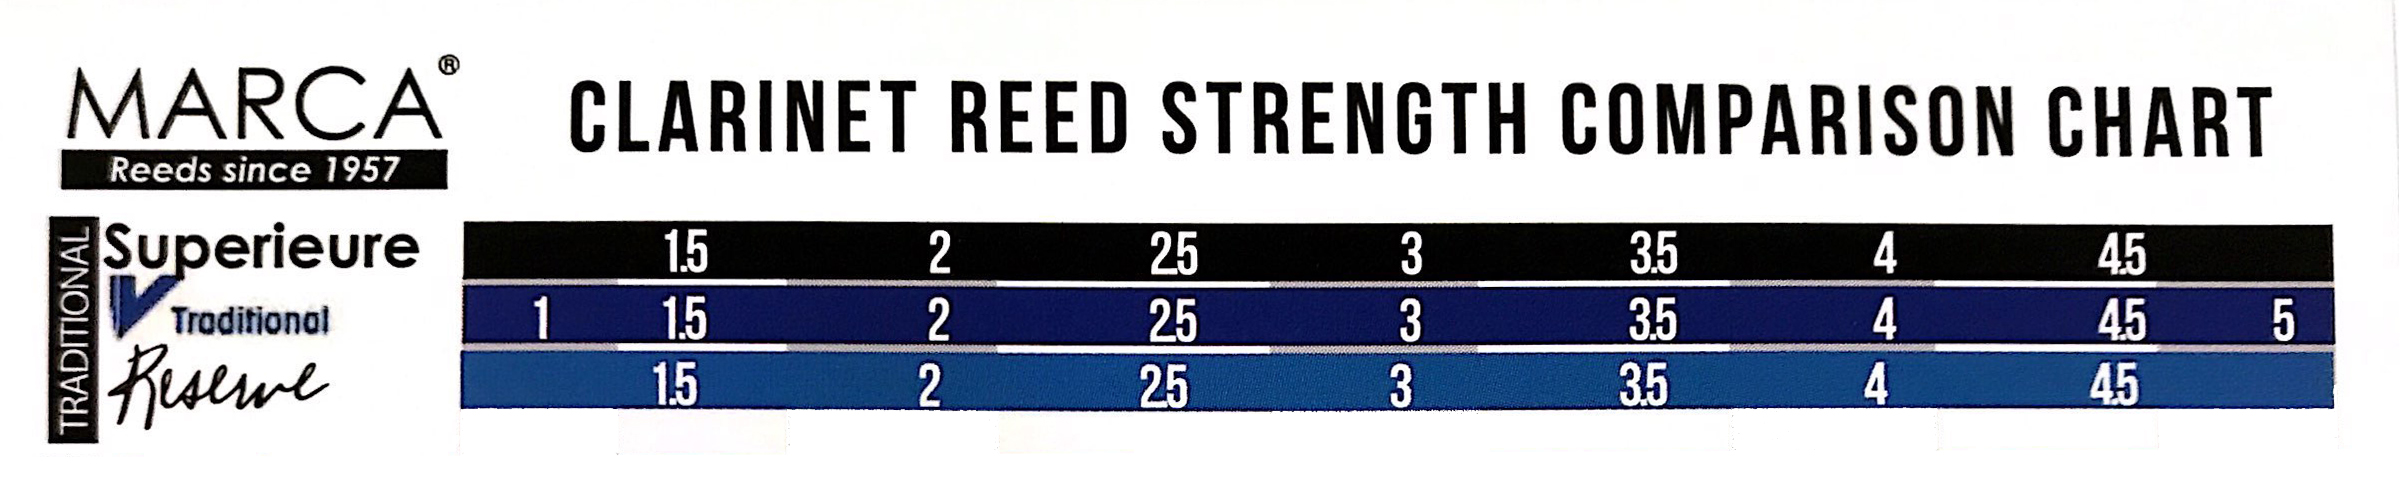 canas marca superieure clarinete comparacion